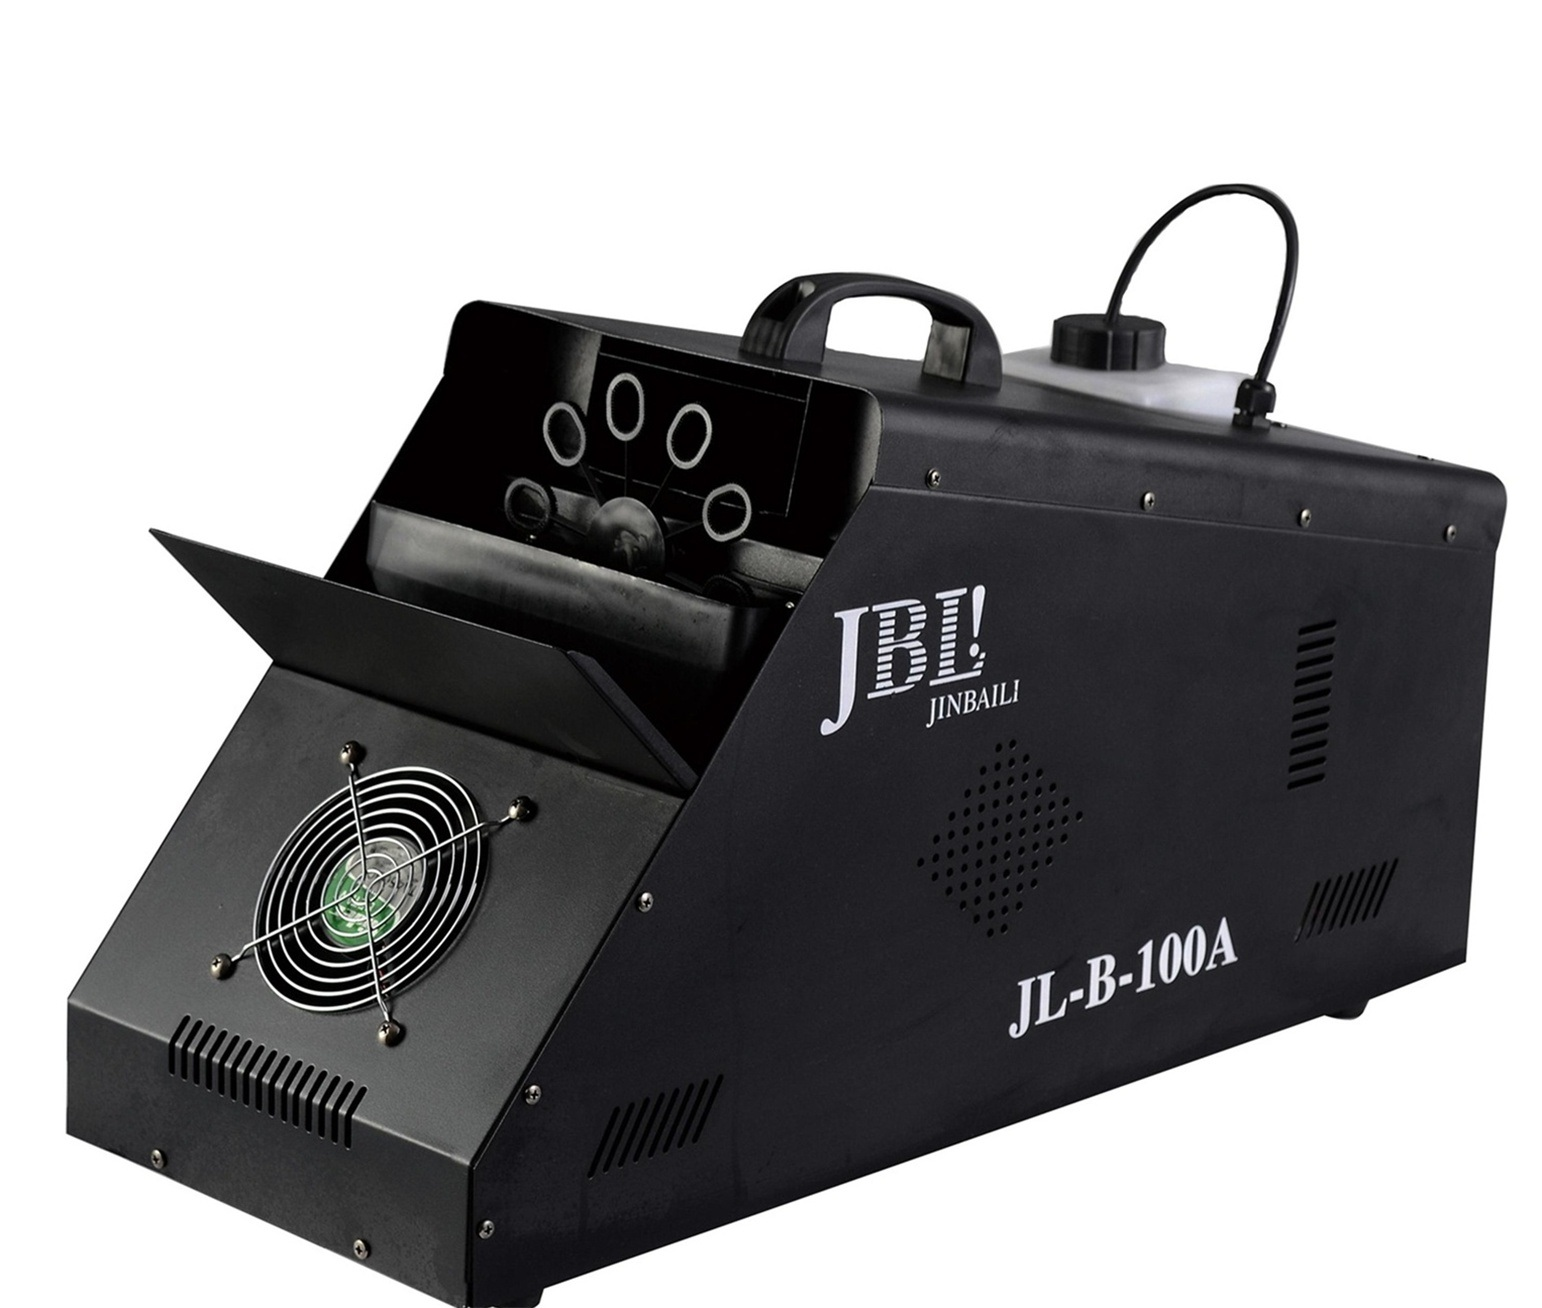 Bubble Machine/ Smoke and Bubble 2 in 1 Machine (Jl-1000)